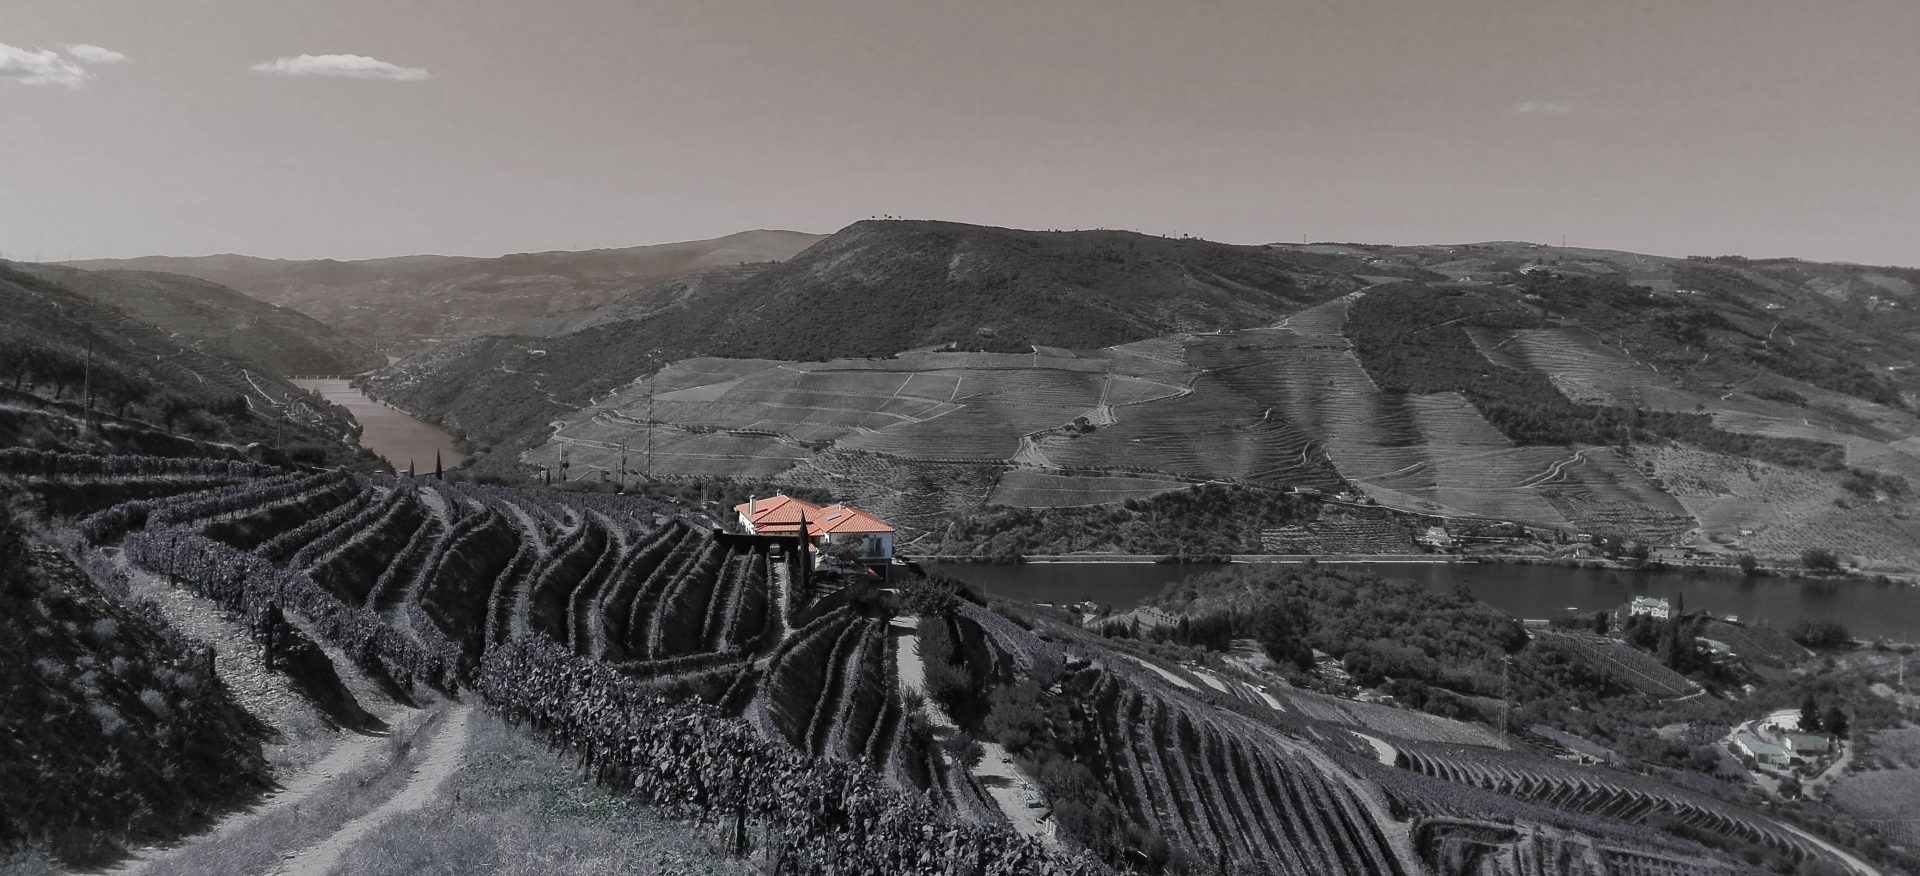 bugalha douro